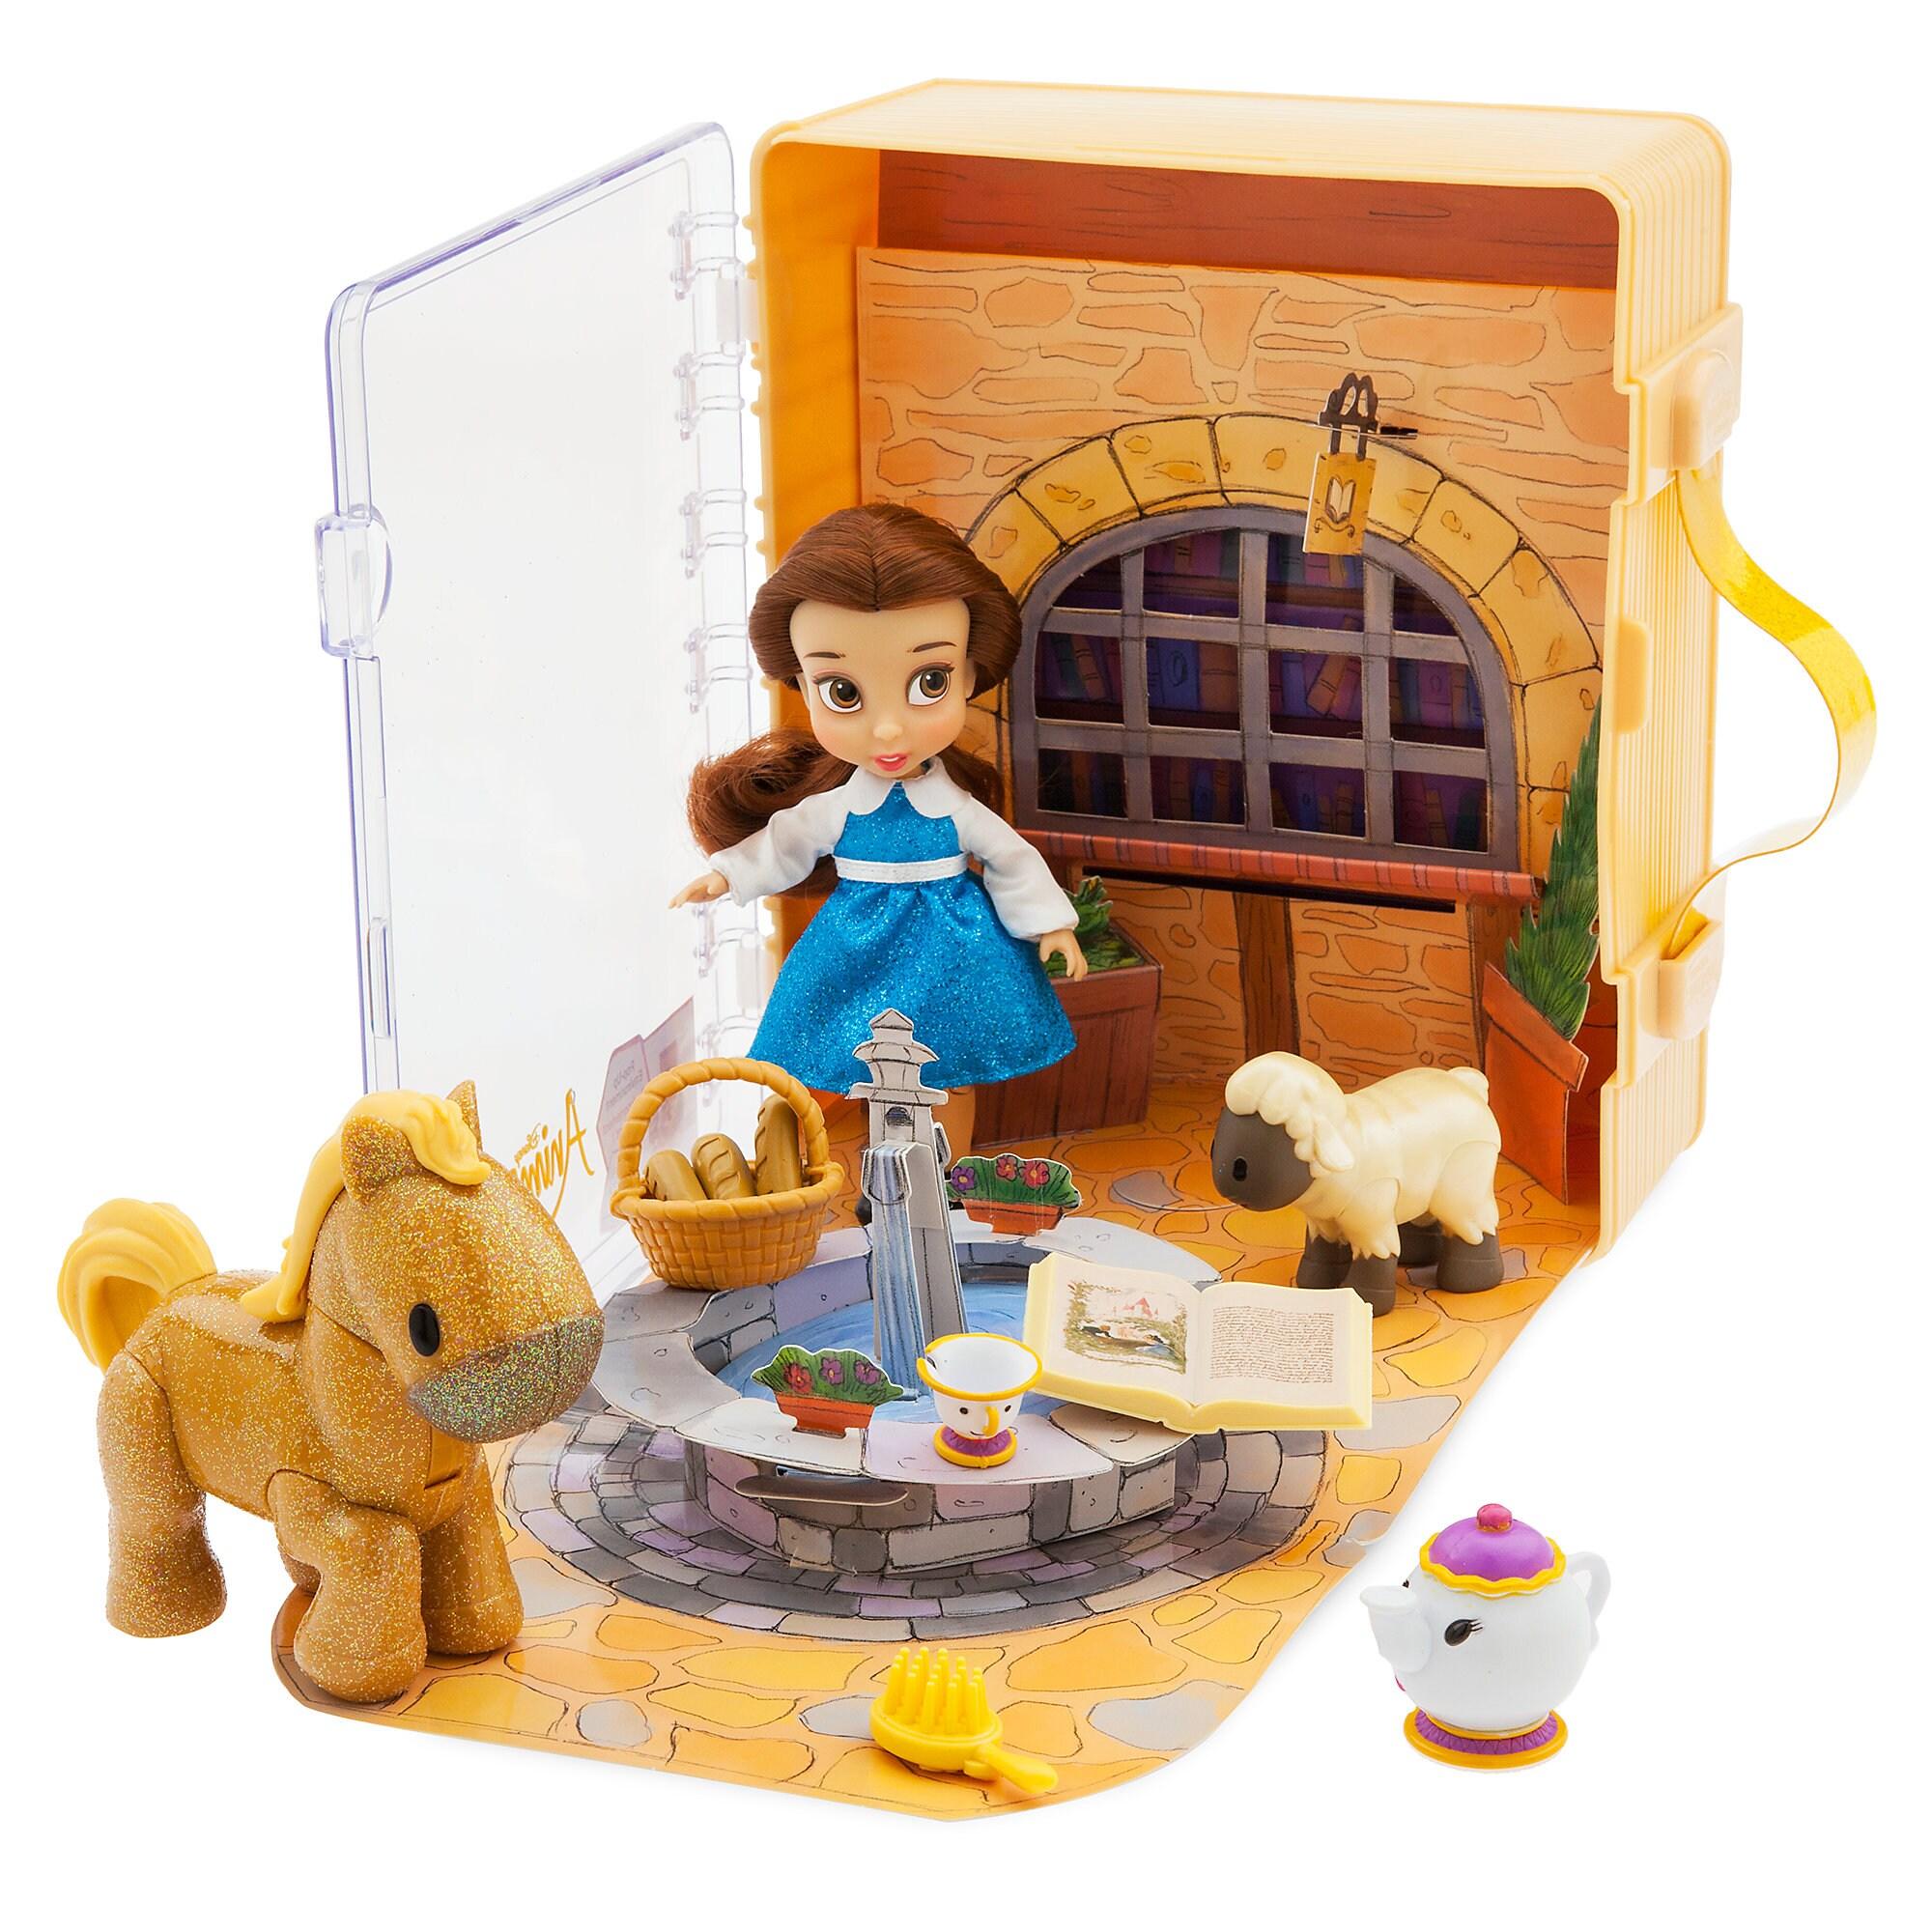 Disney Animators' Collection Belle Mini Doll Play Set has hit the shelves